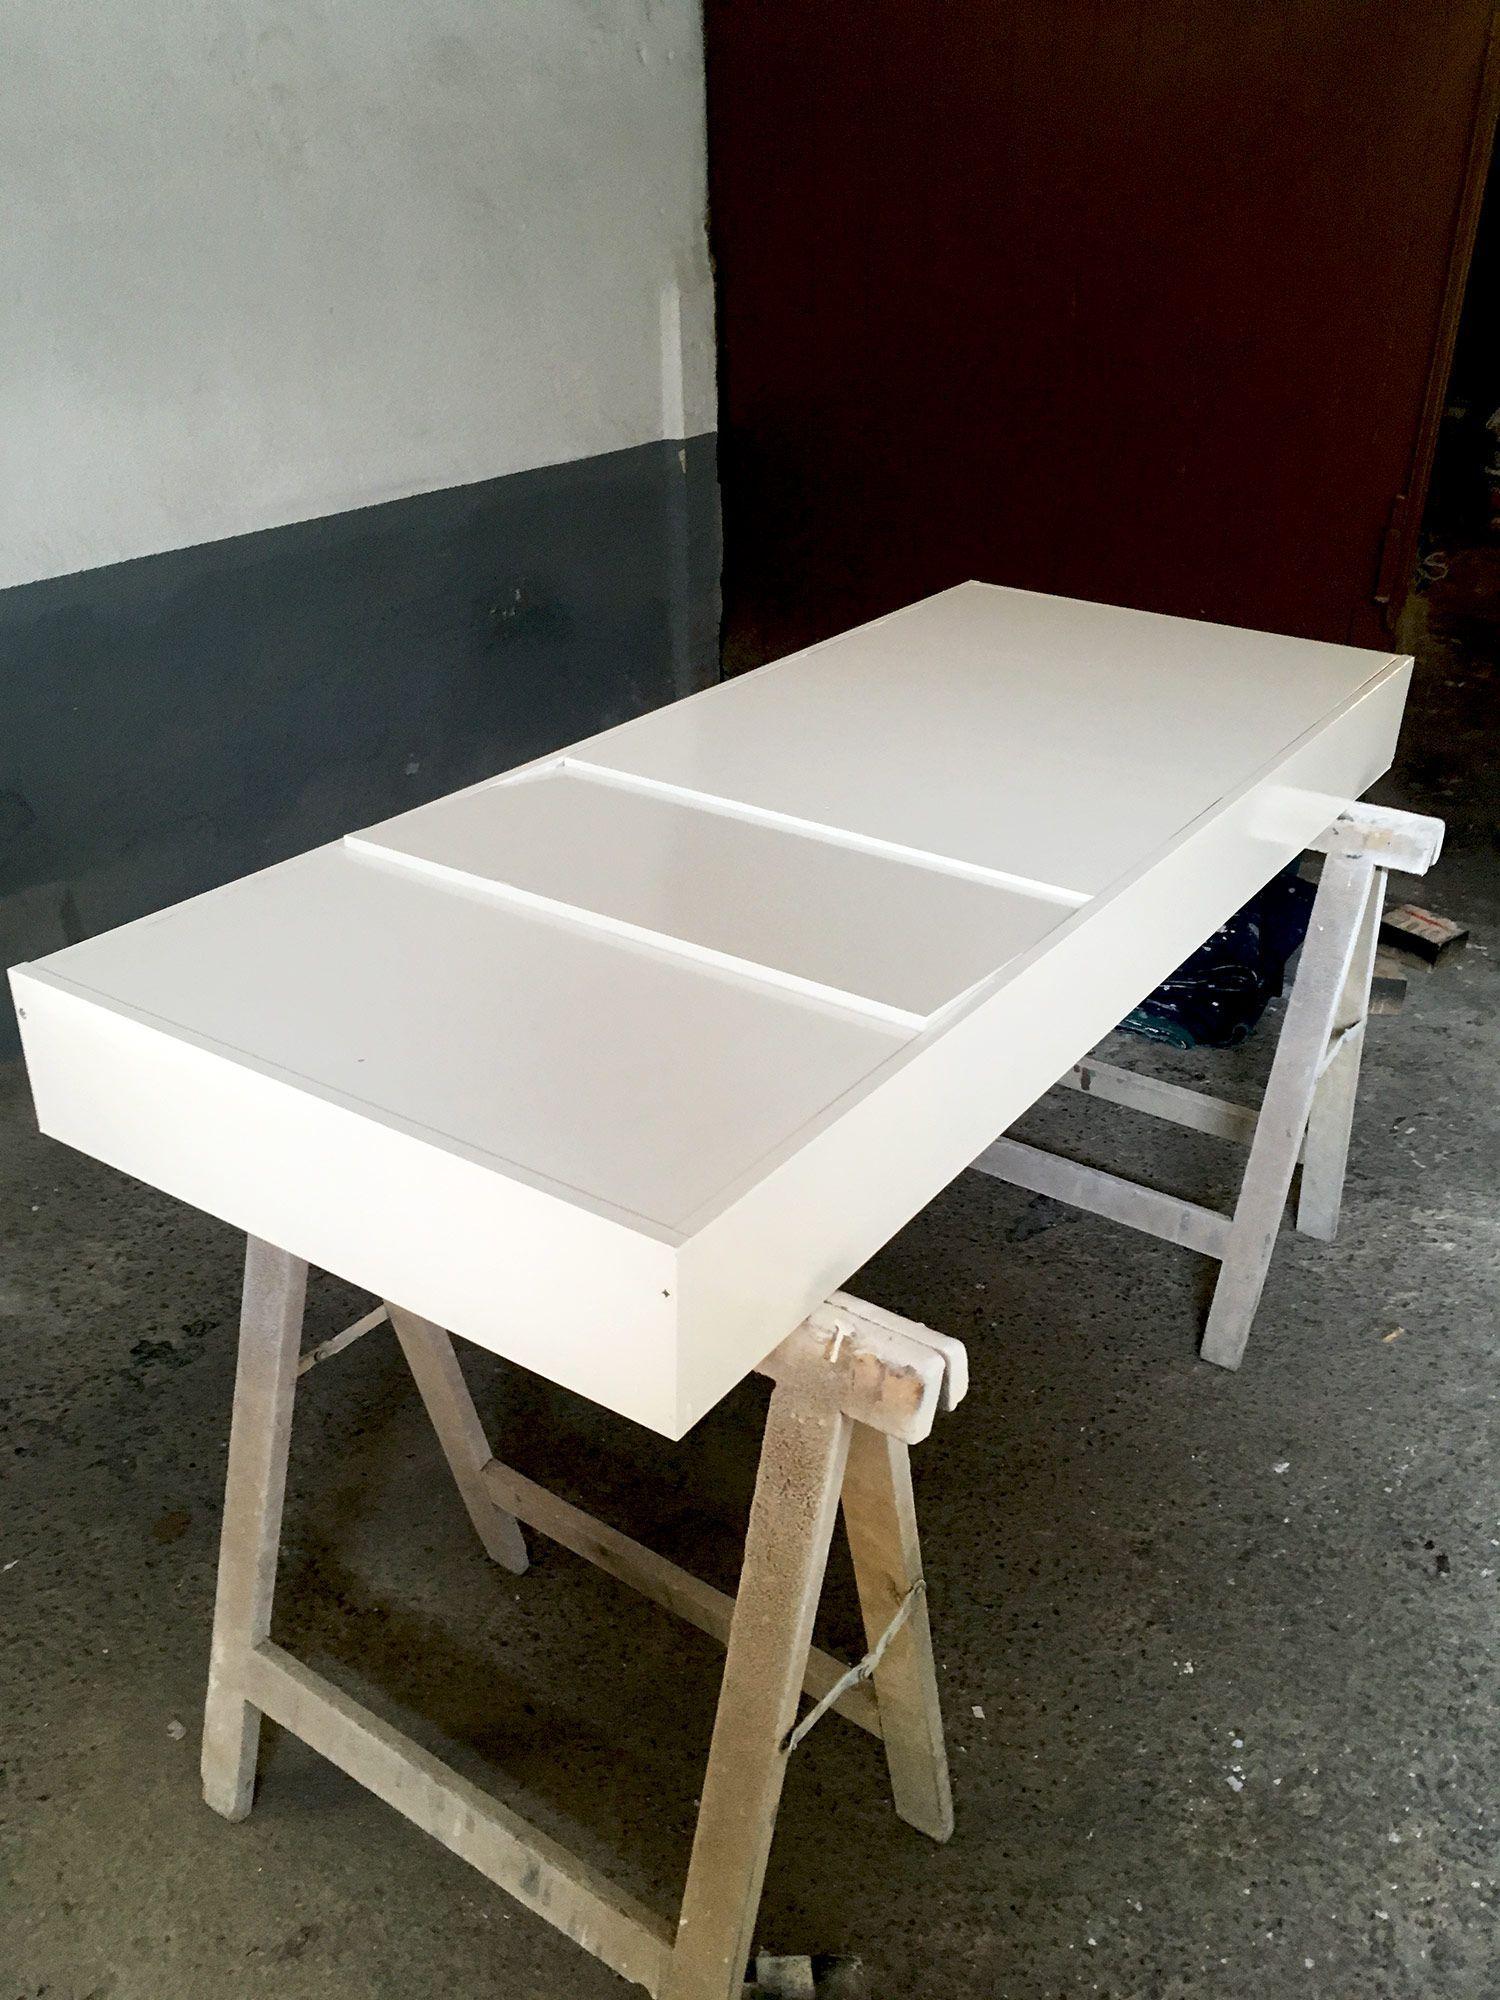 pintando mueble zapatero de madera